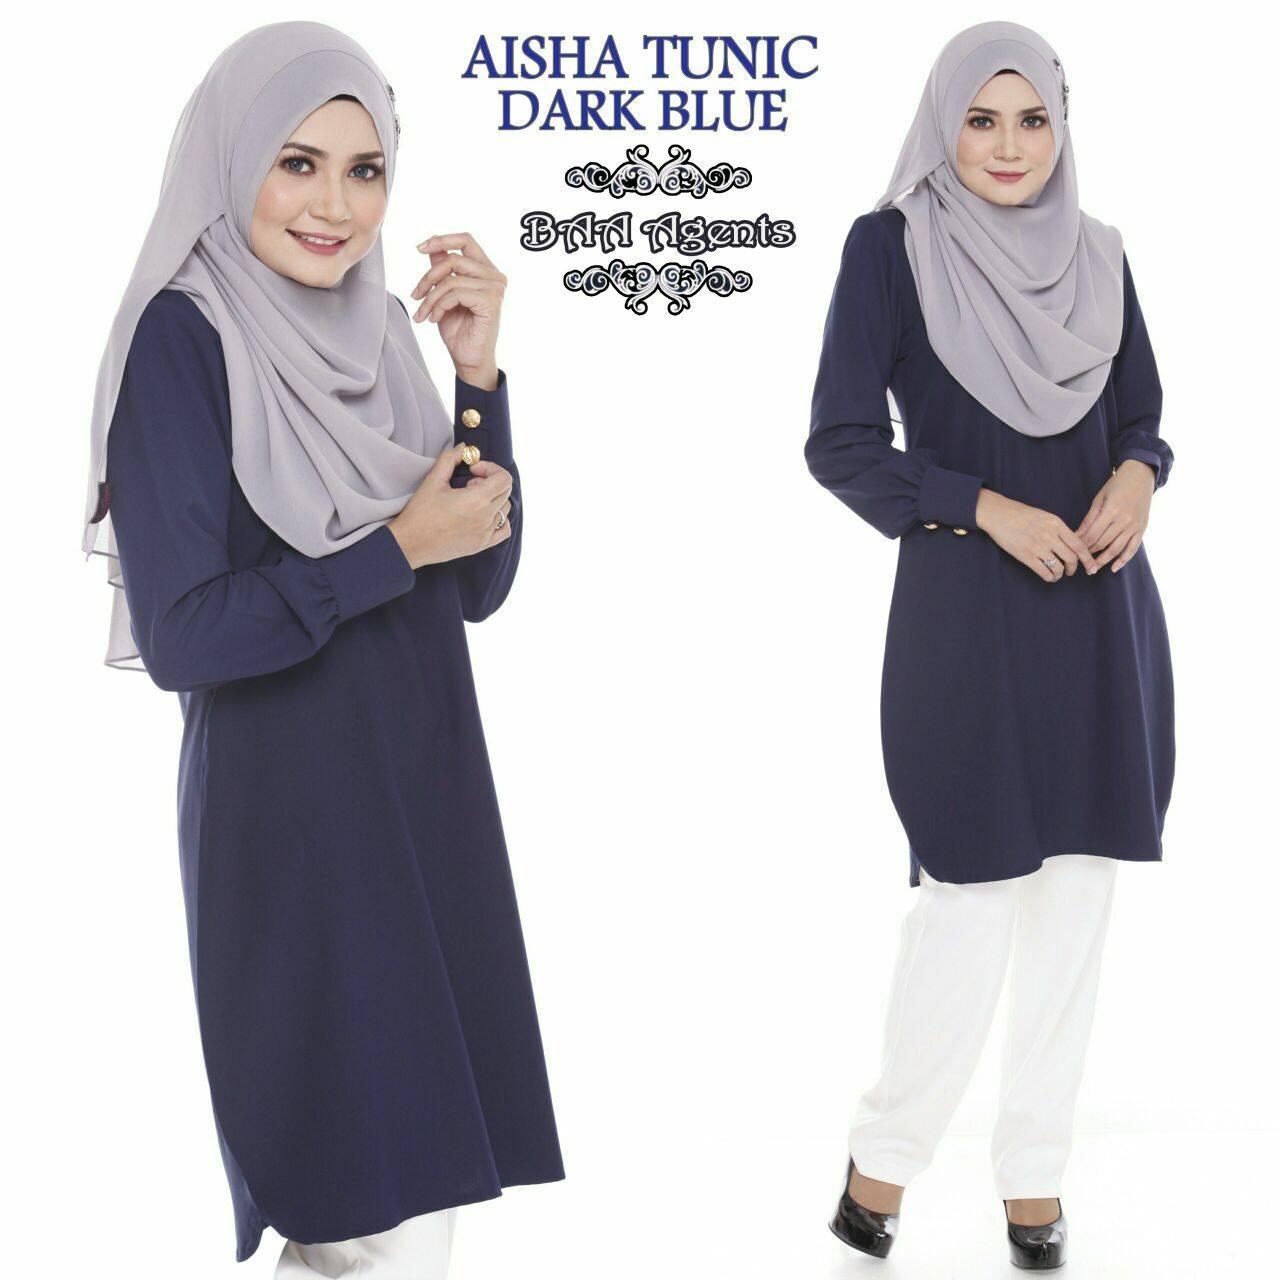 TUNIC MUSLIMAH AISHA DARK BLUE